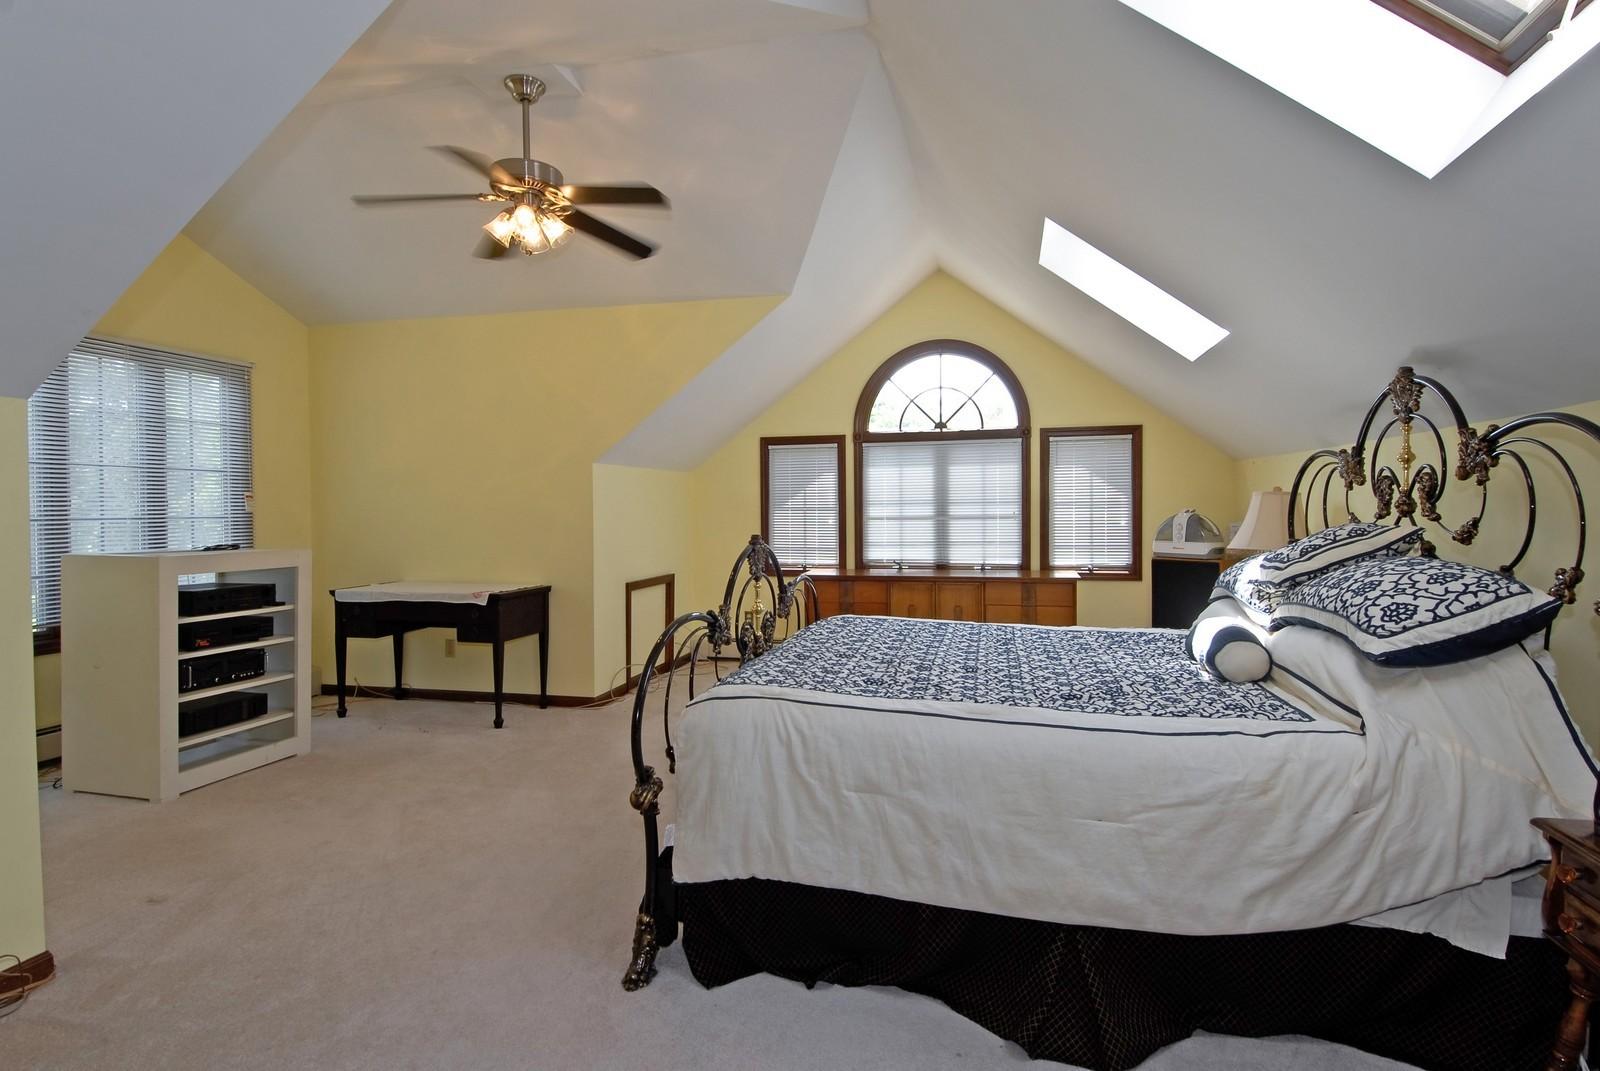 Real Estate Photography - 94 Pletcher Dr, Yorkville, IL, 60560 - Master Bedroom